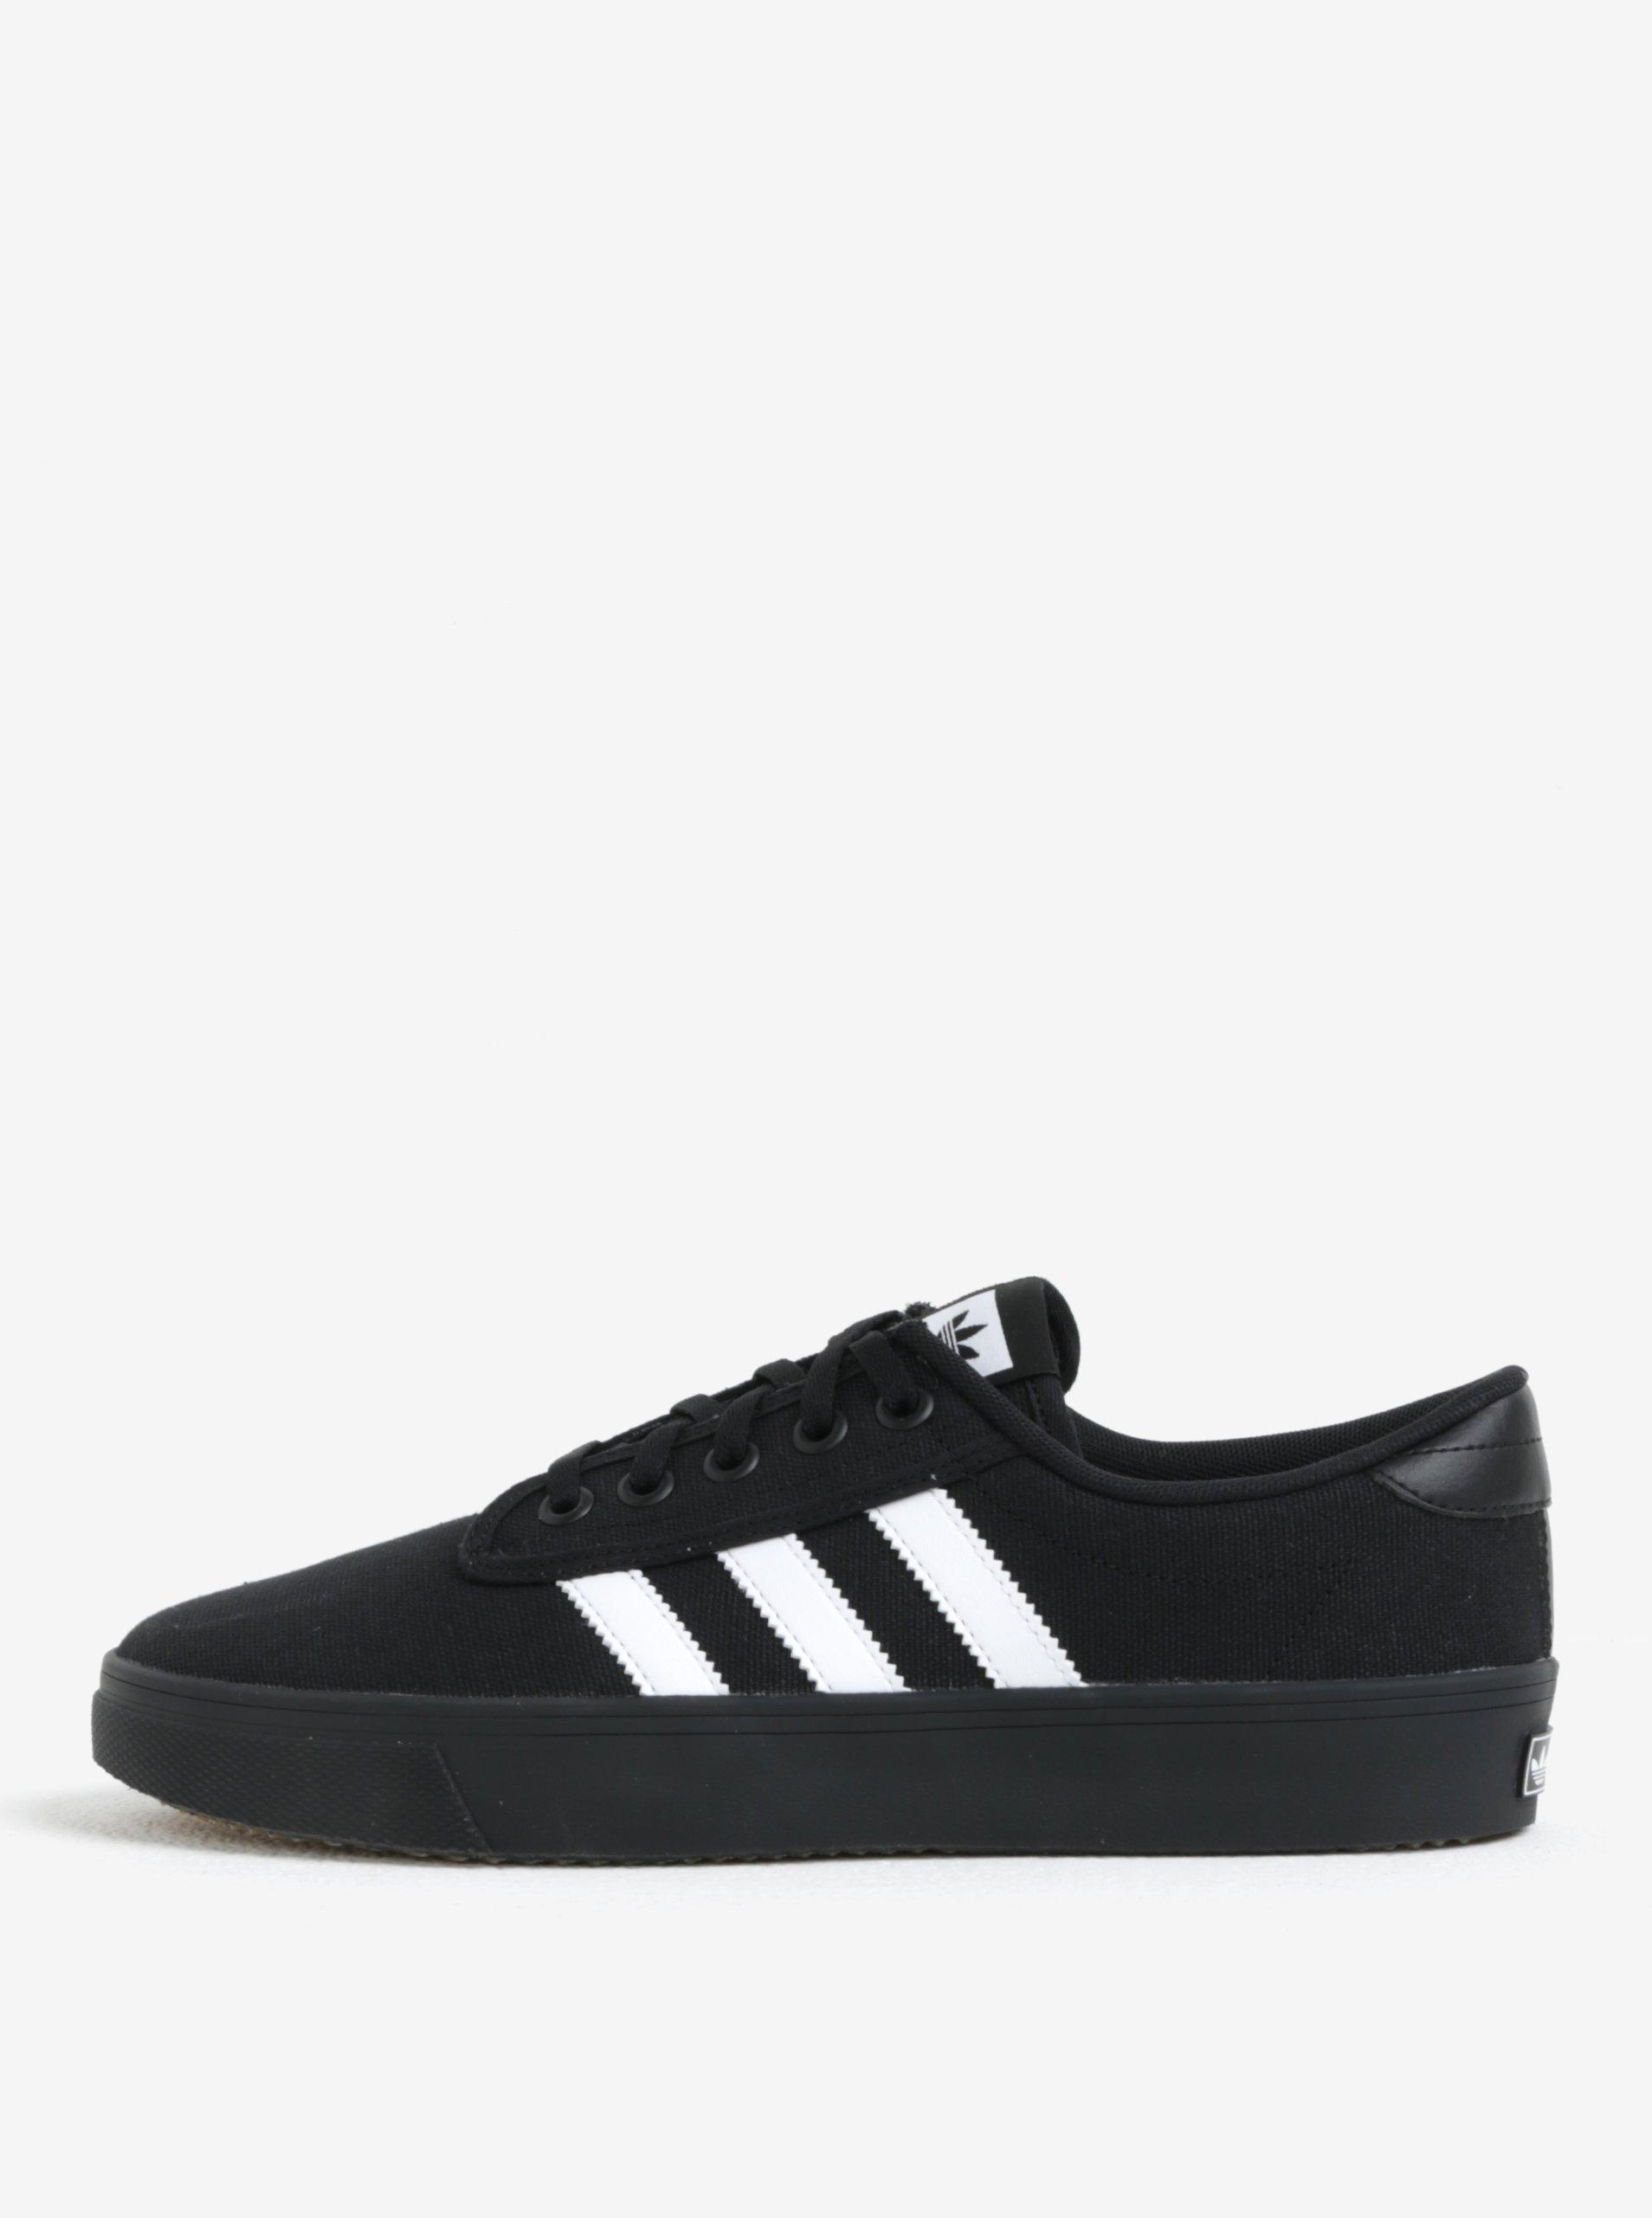 Čierne tenisky adidas Originals Kiel  39c1d60f1e2